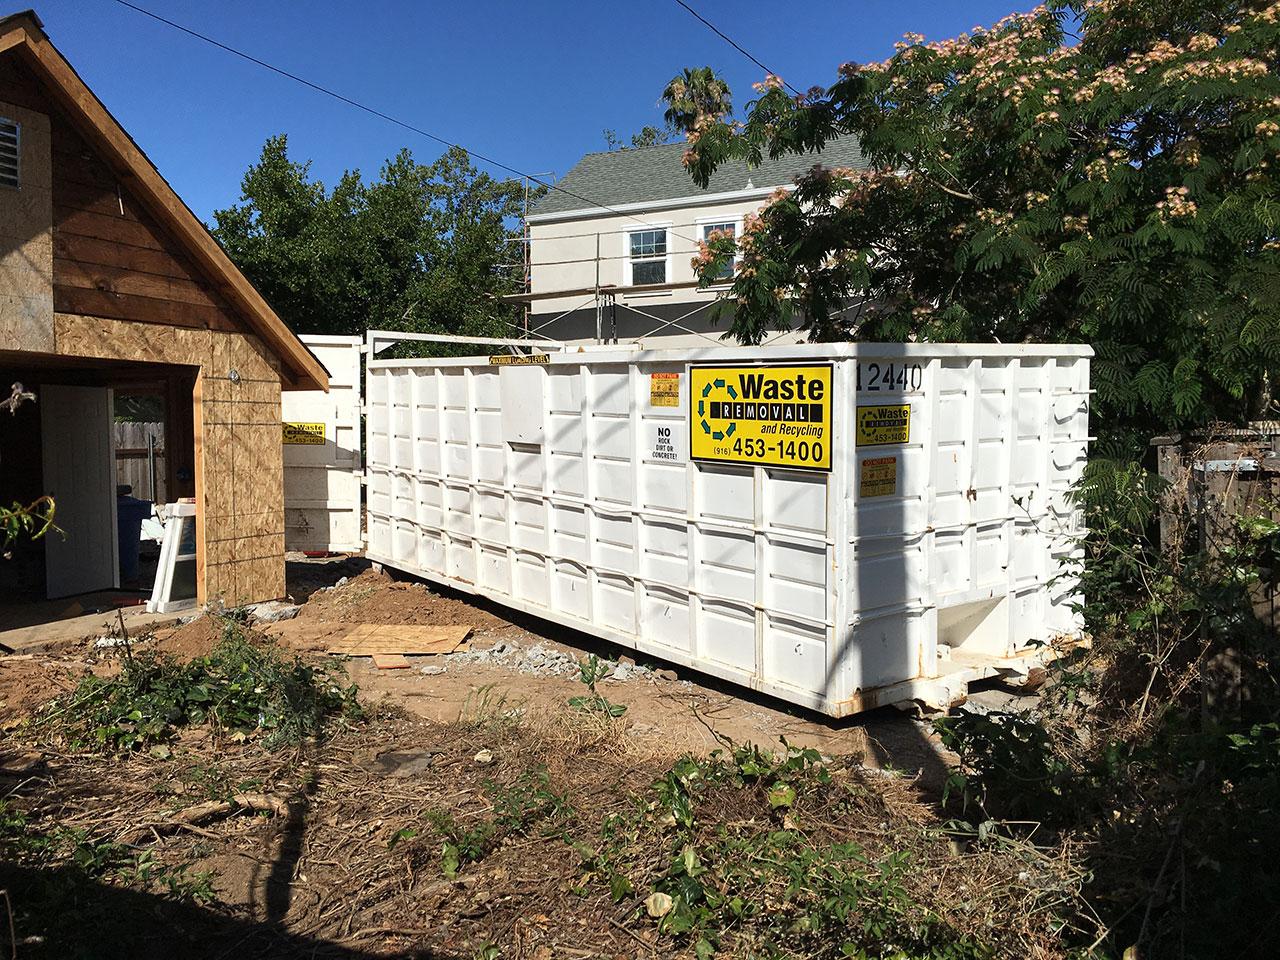 40 Yard Dumpster East Sacramento